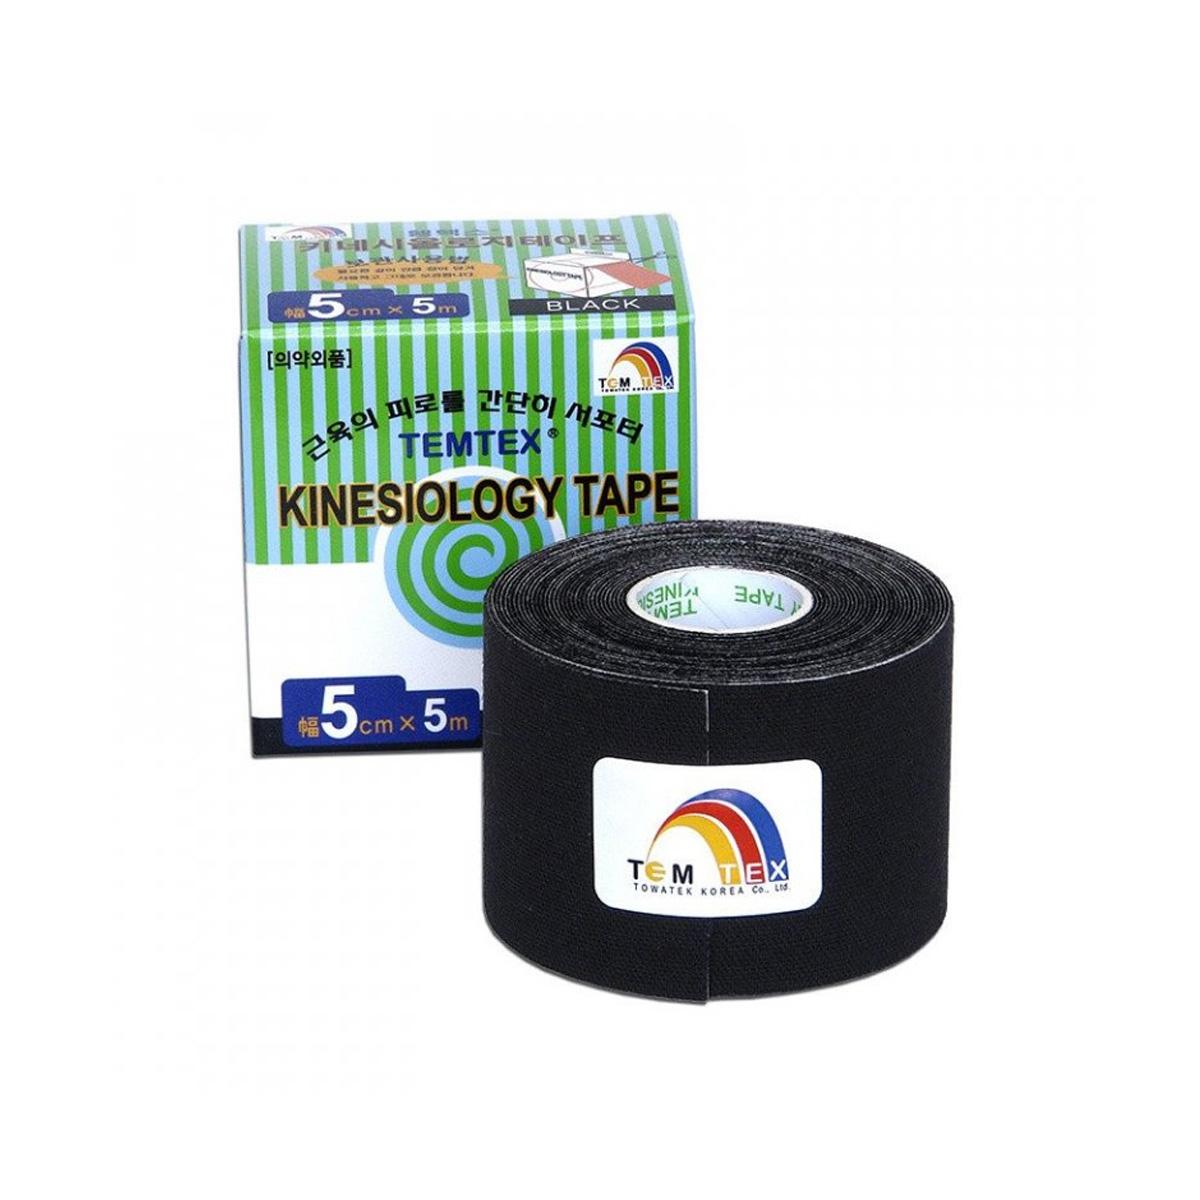 Temtex kinesio tape Classic černá 5cm x 5m